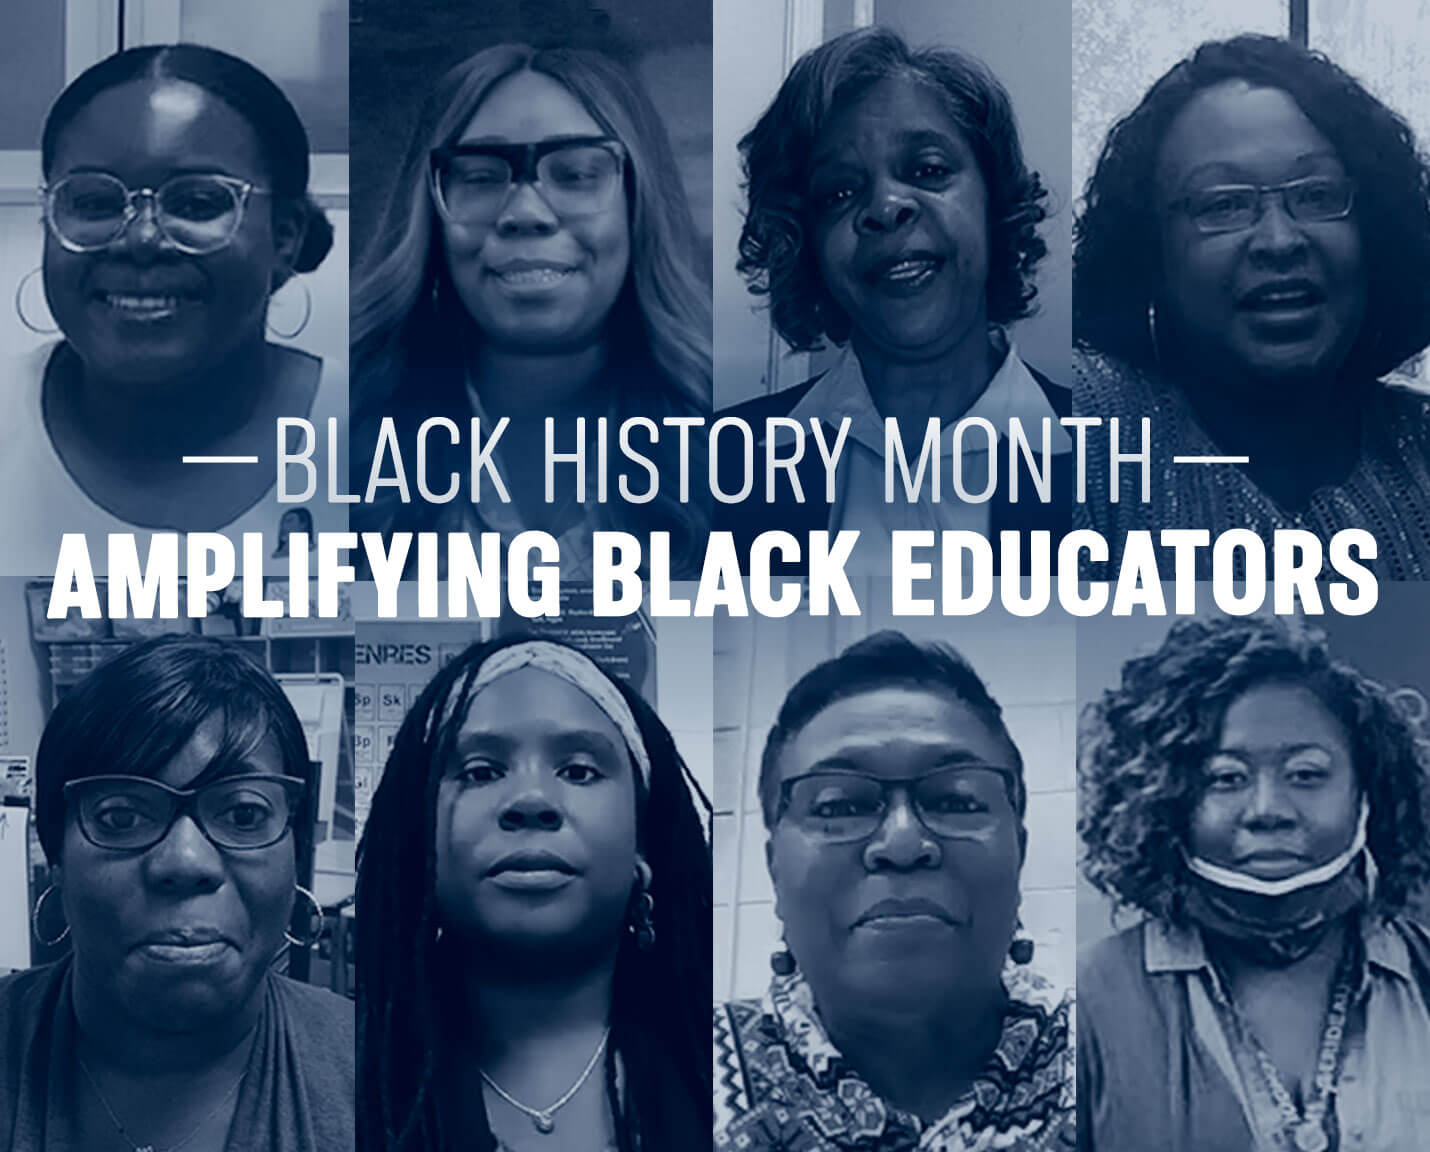 black history month—amplifying black educators